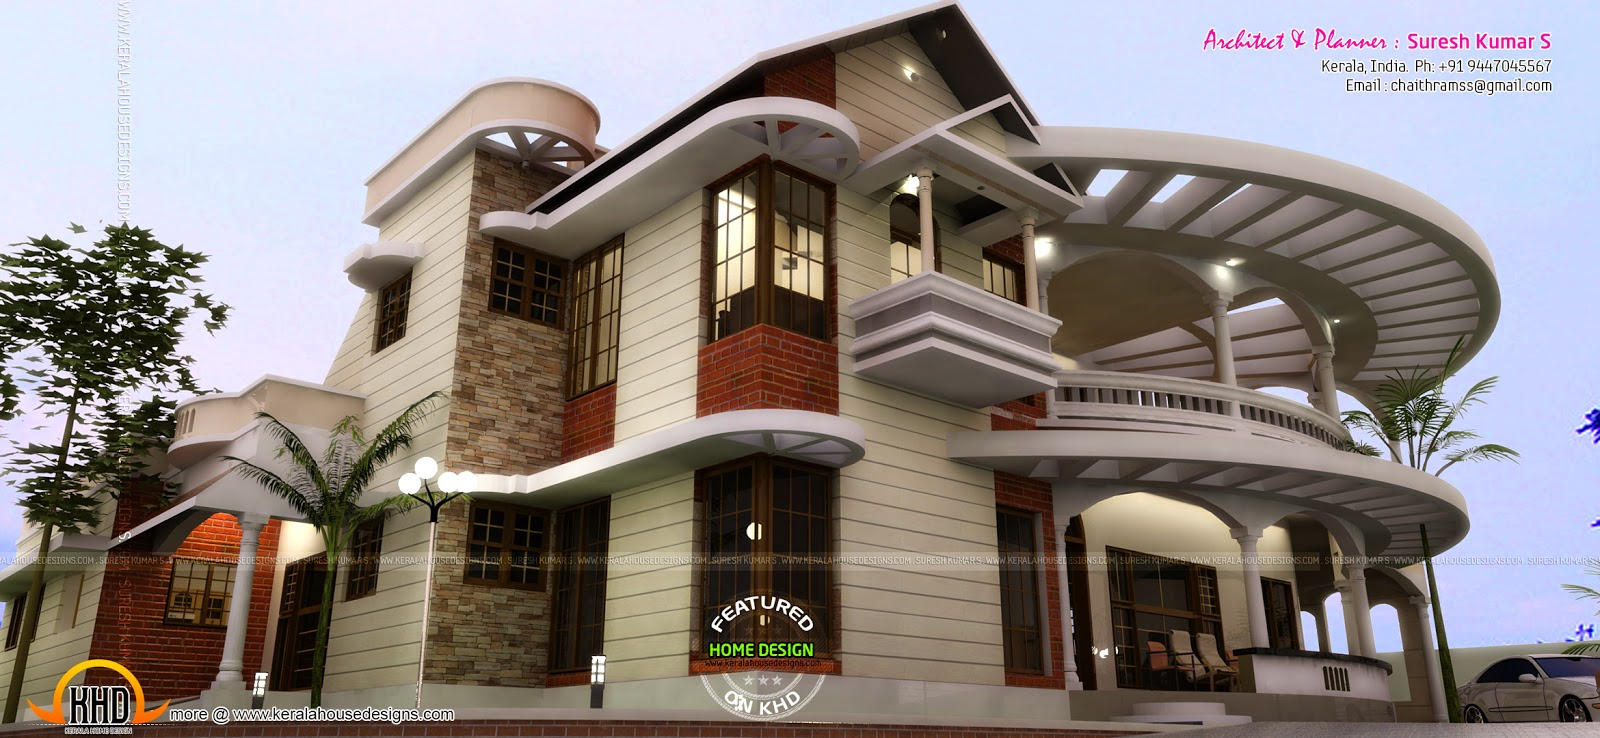 Great looking house design by Suresh Kumar - Kerala home ...